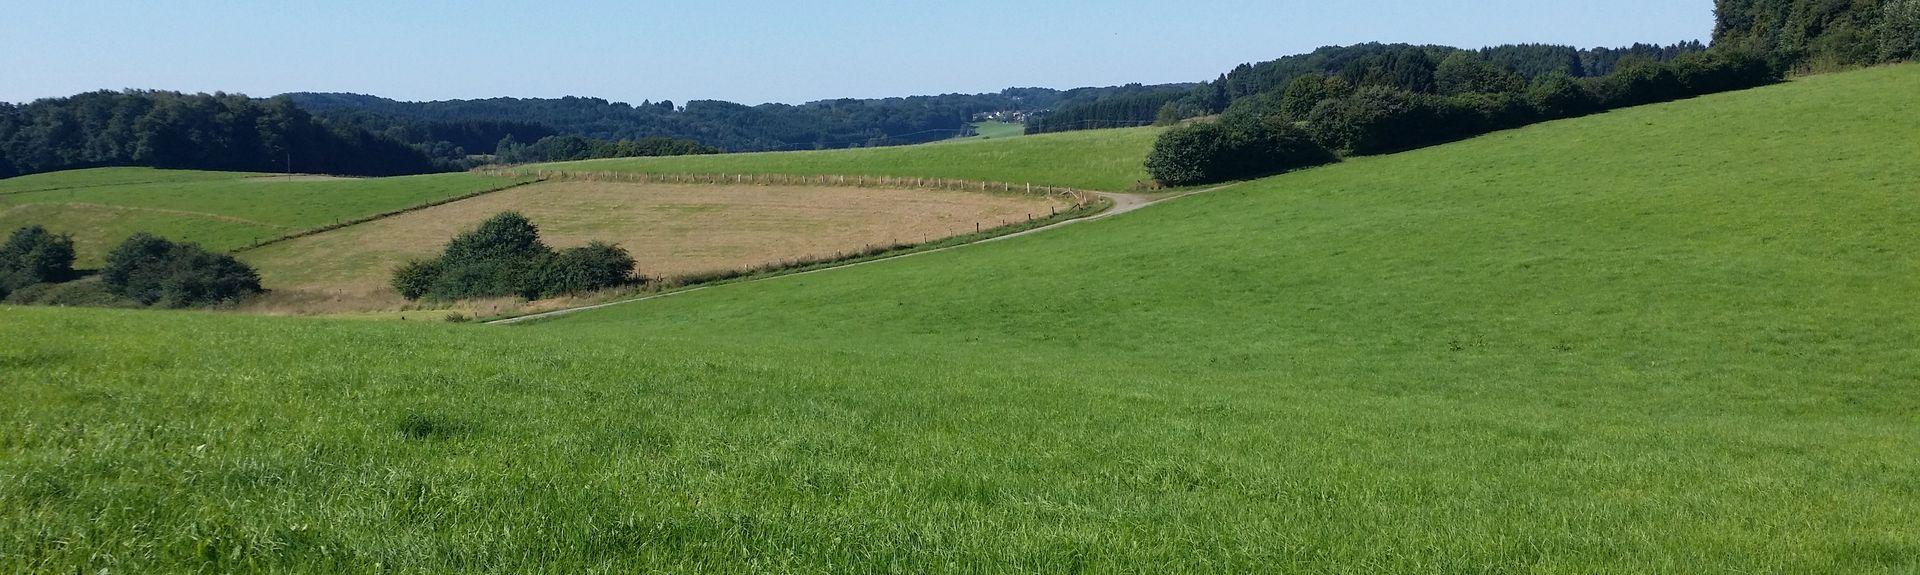 Remscheid, North Rhine-Westphalia, Germany